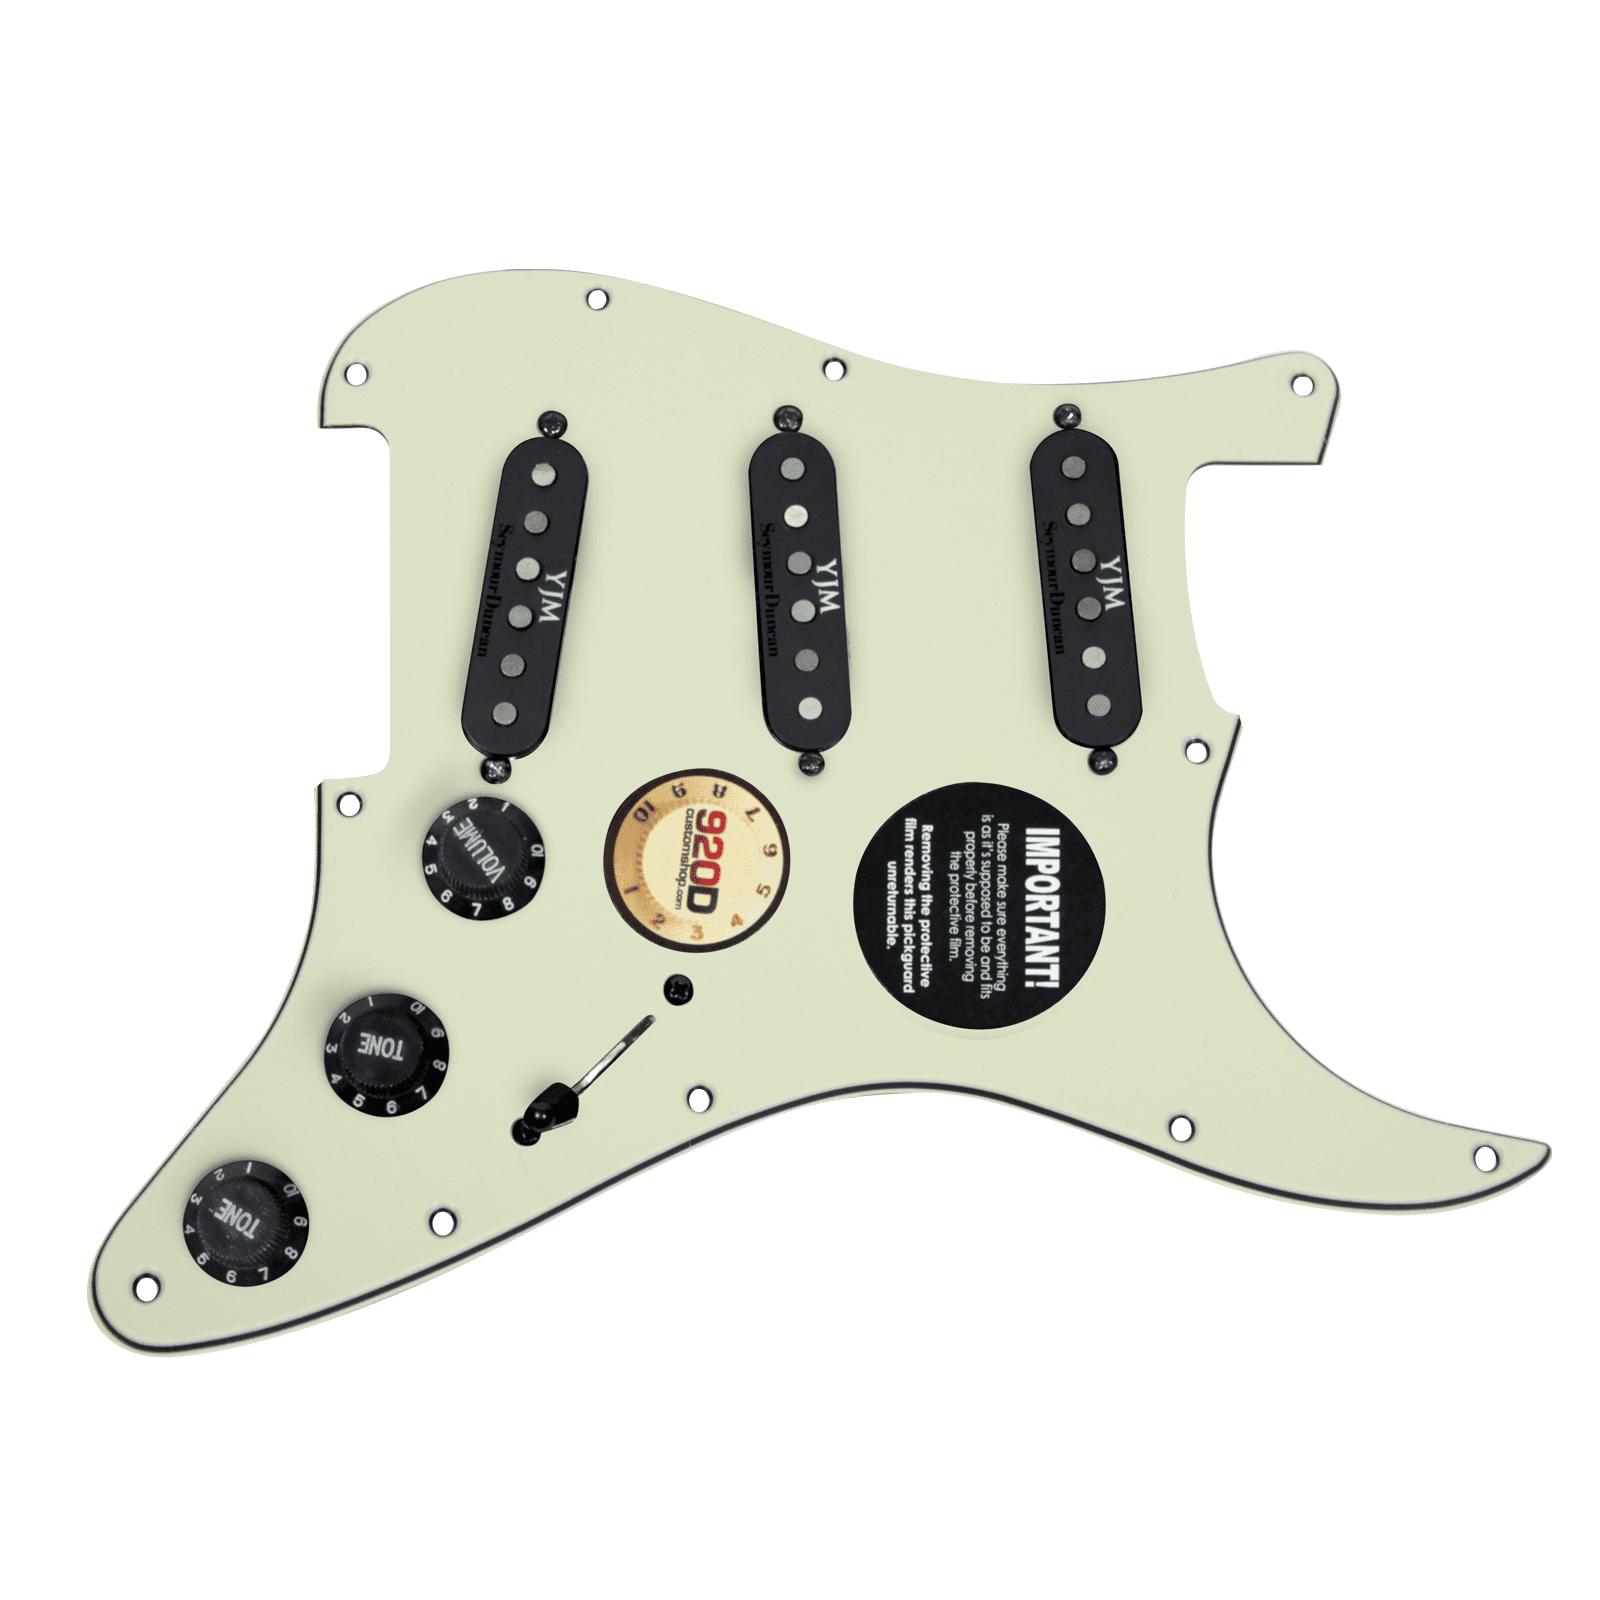 920D Fender Strat Loaded Pickguard Duncan Yngwie Malmsteen YJM Fury USA MG BK by